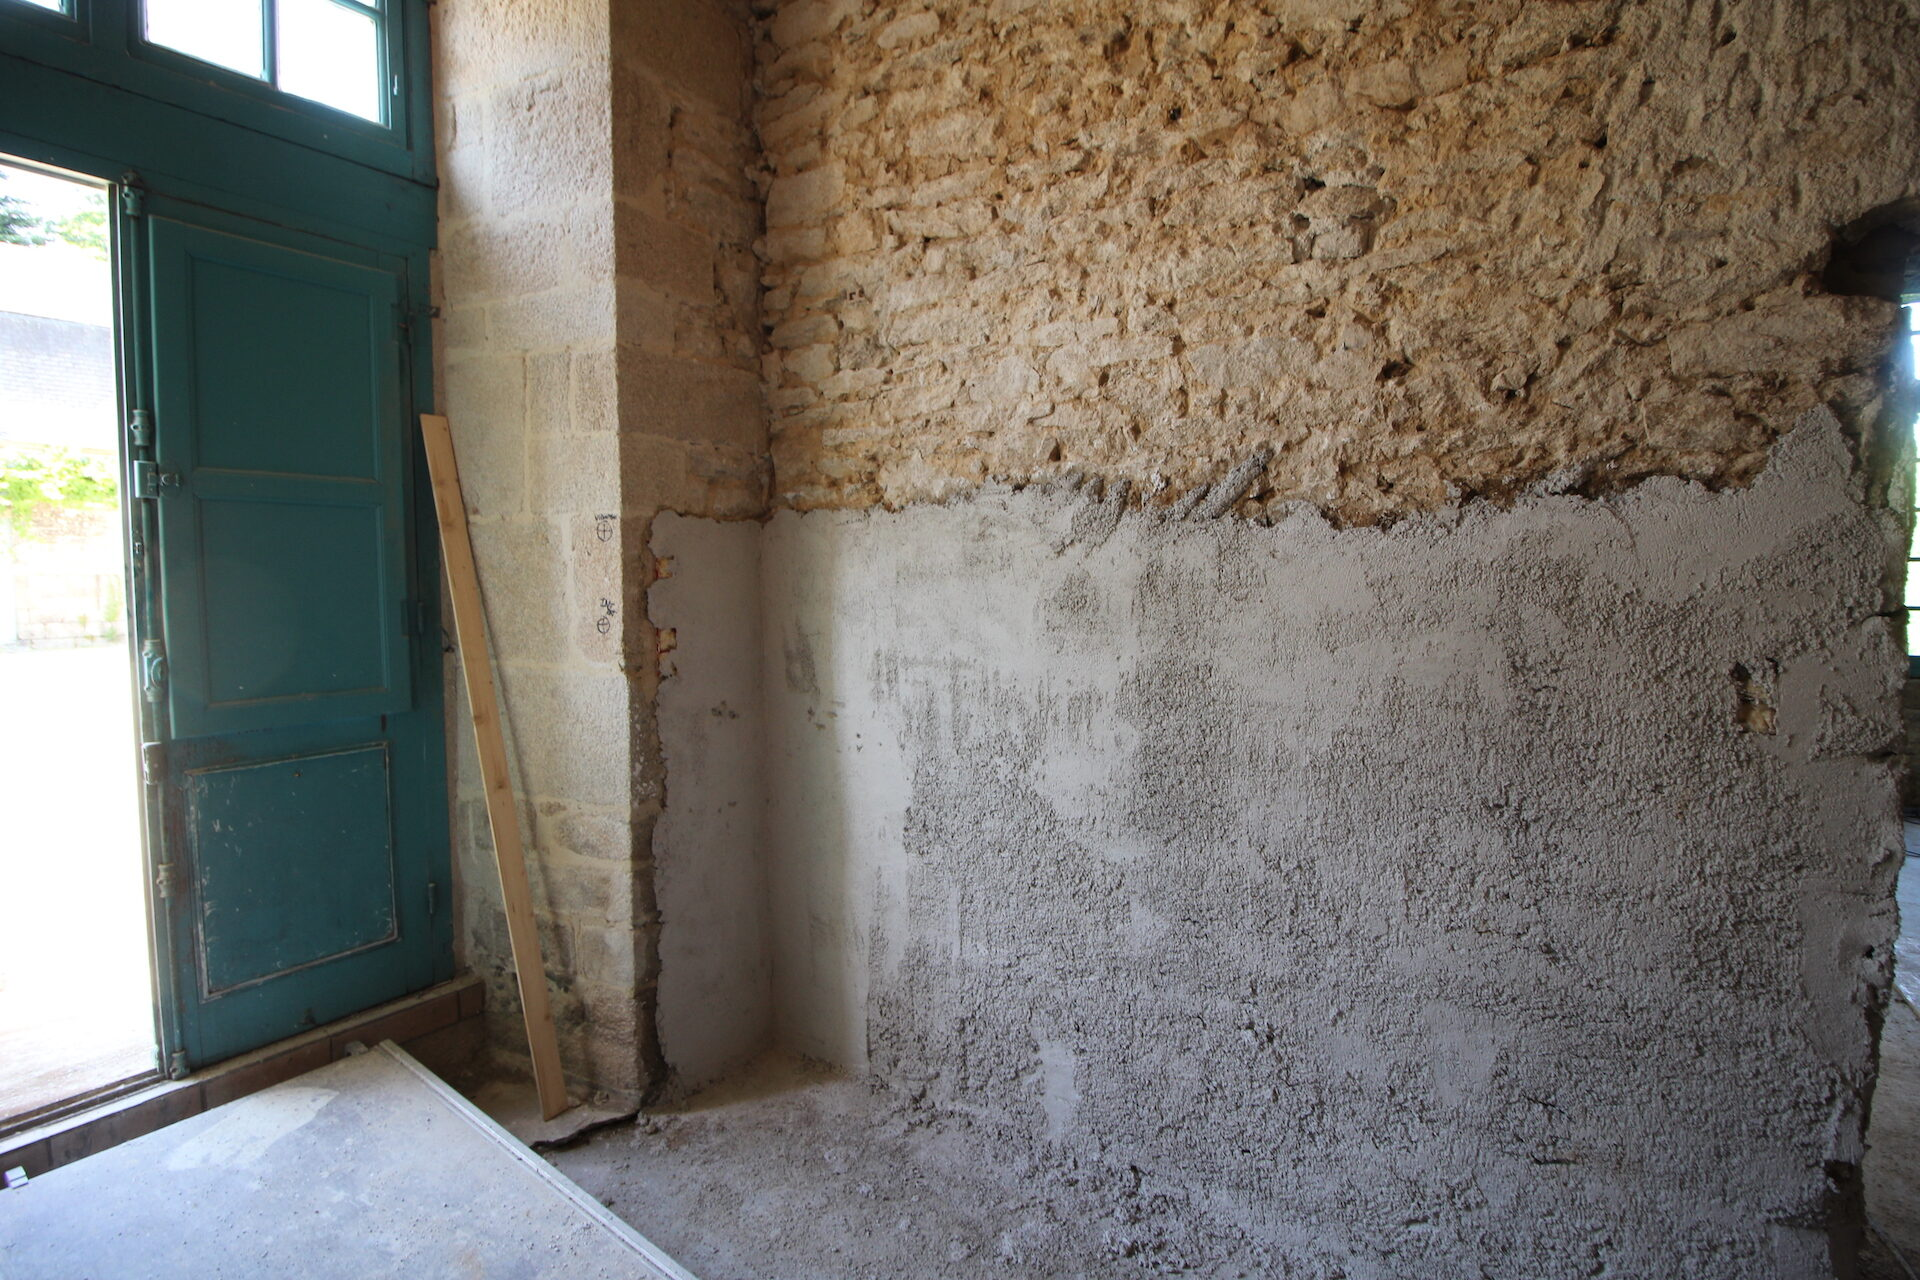 CSDK Lissage de murs en terre Bretagne 4 1920x1280 - Sustainable engagement - CSDK Lissage de murs en terre Bretagne 4 1920x1280